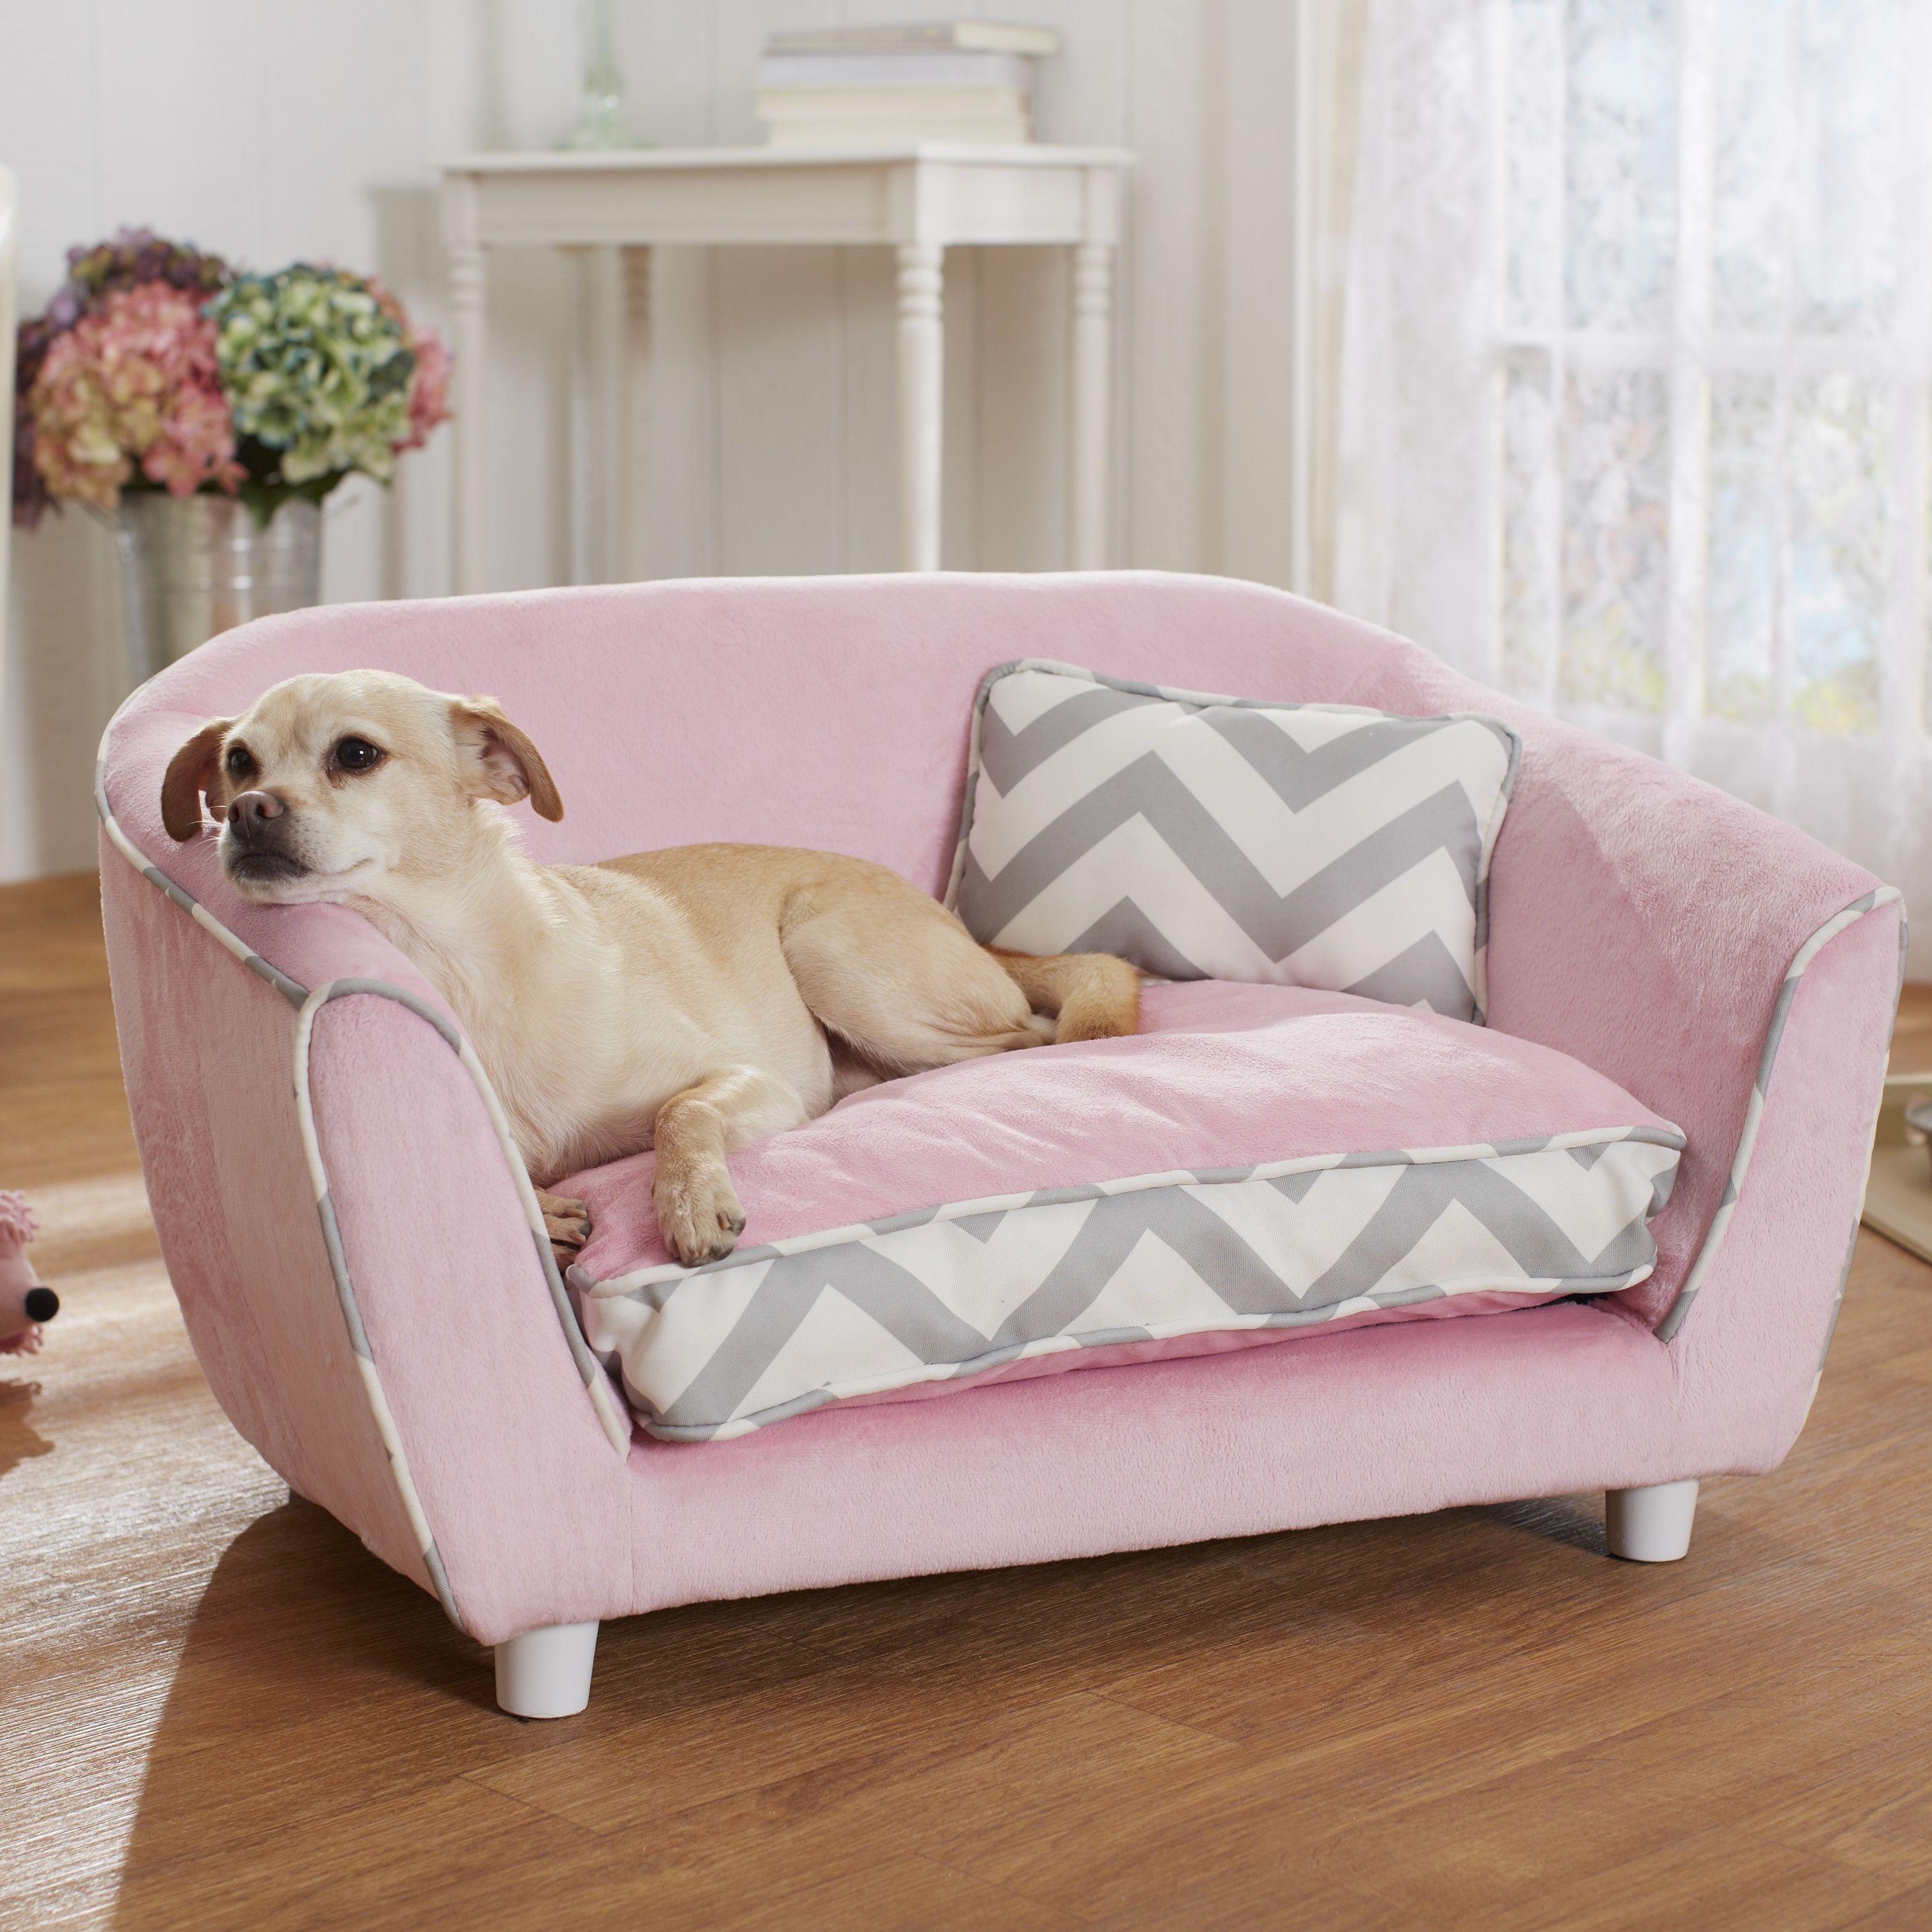 Small Dog Sofa 25 Unique Dog Sofa Bed Ideas On Pinterest